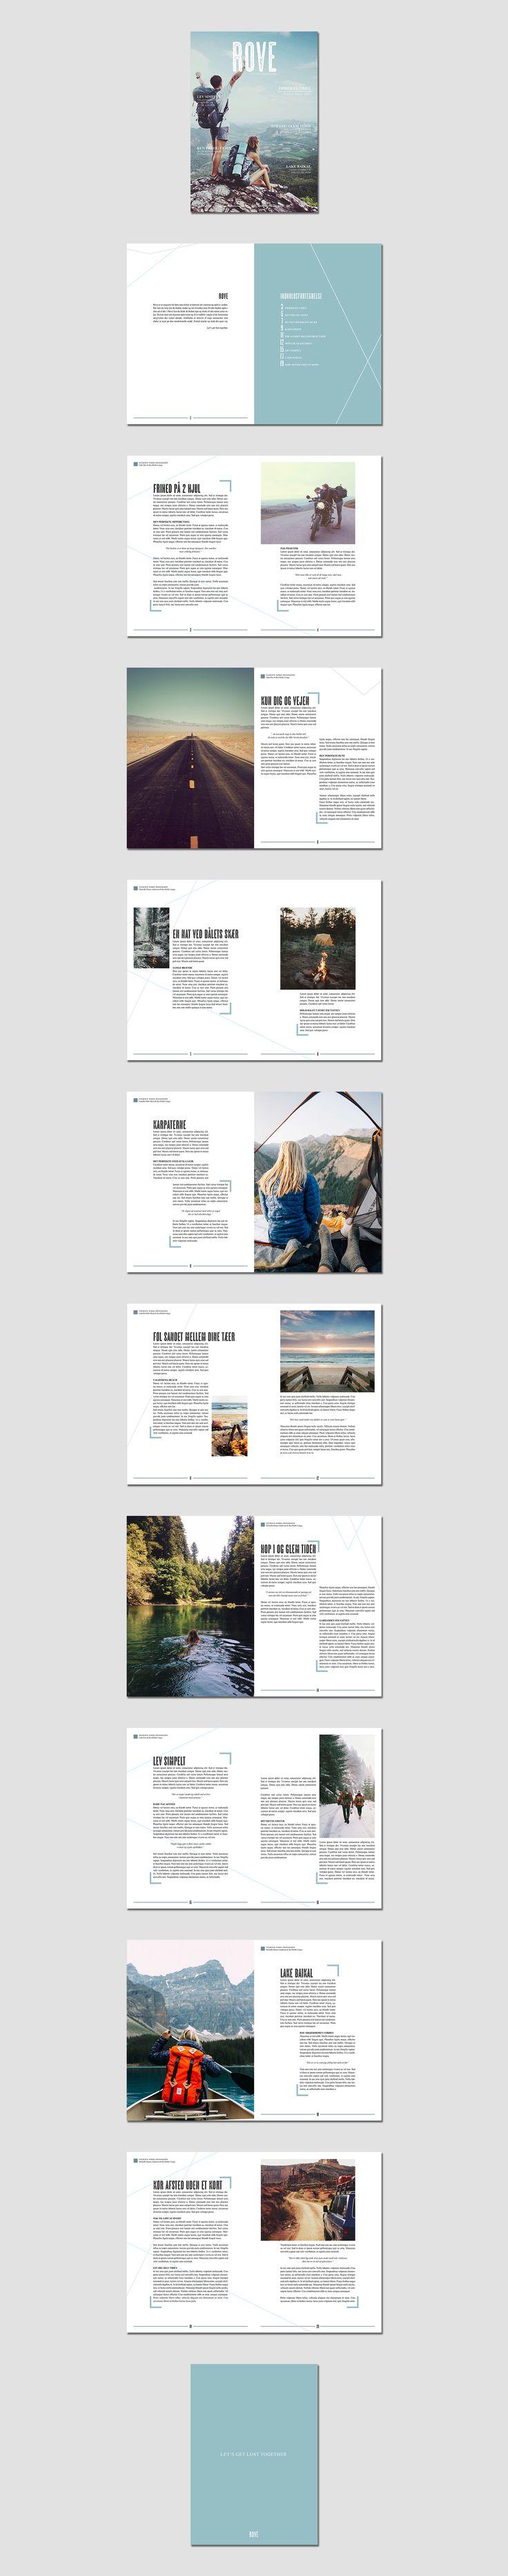 Magazine. Design & Layout by Kia Lange.